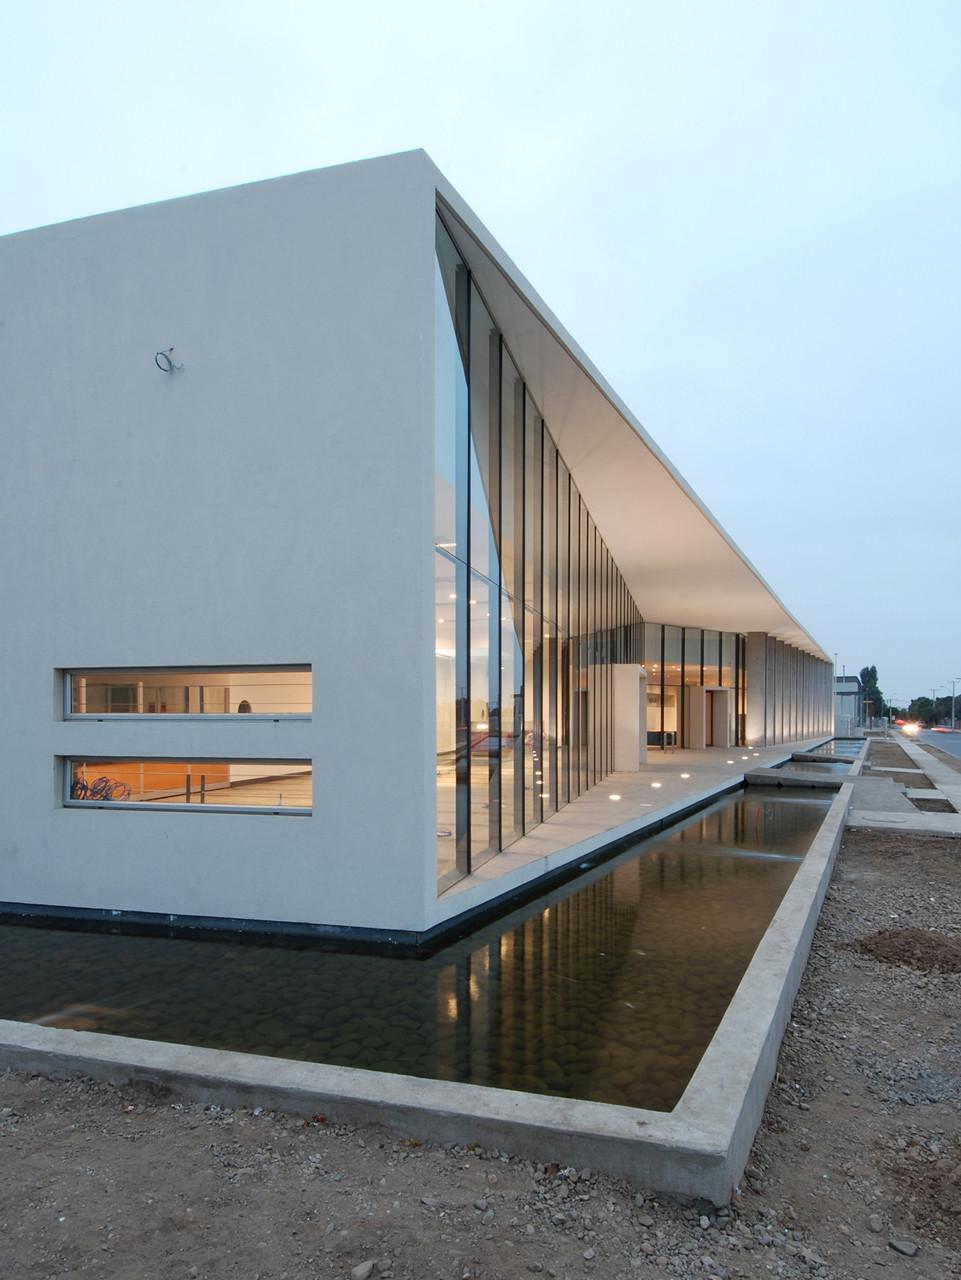 Galer a de oficina comercial conafe tng arquitectos 12 for Minimalist house boat